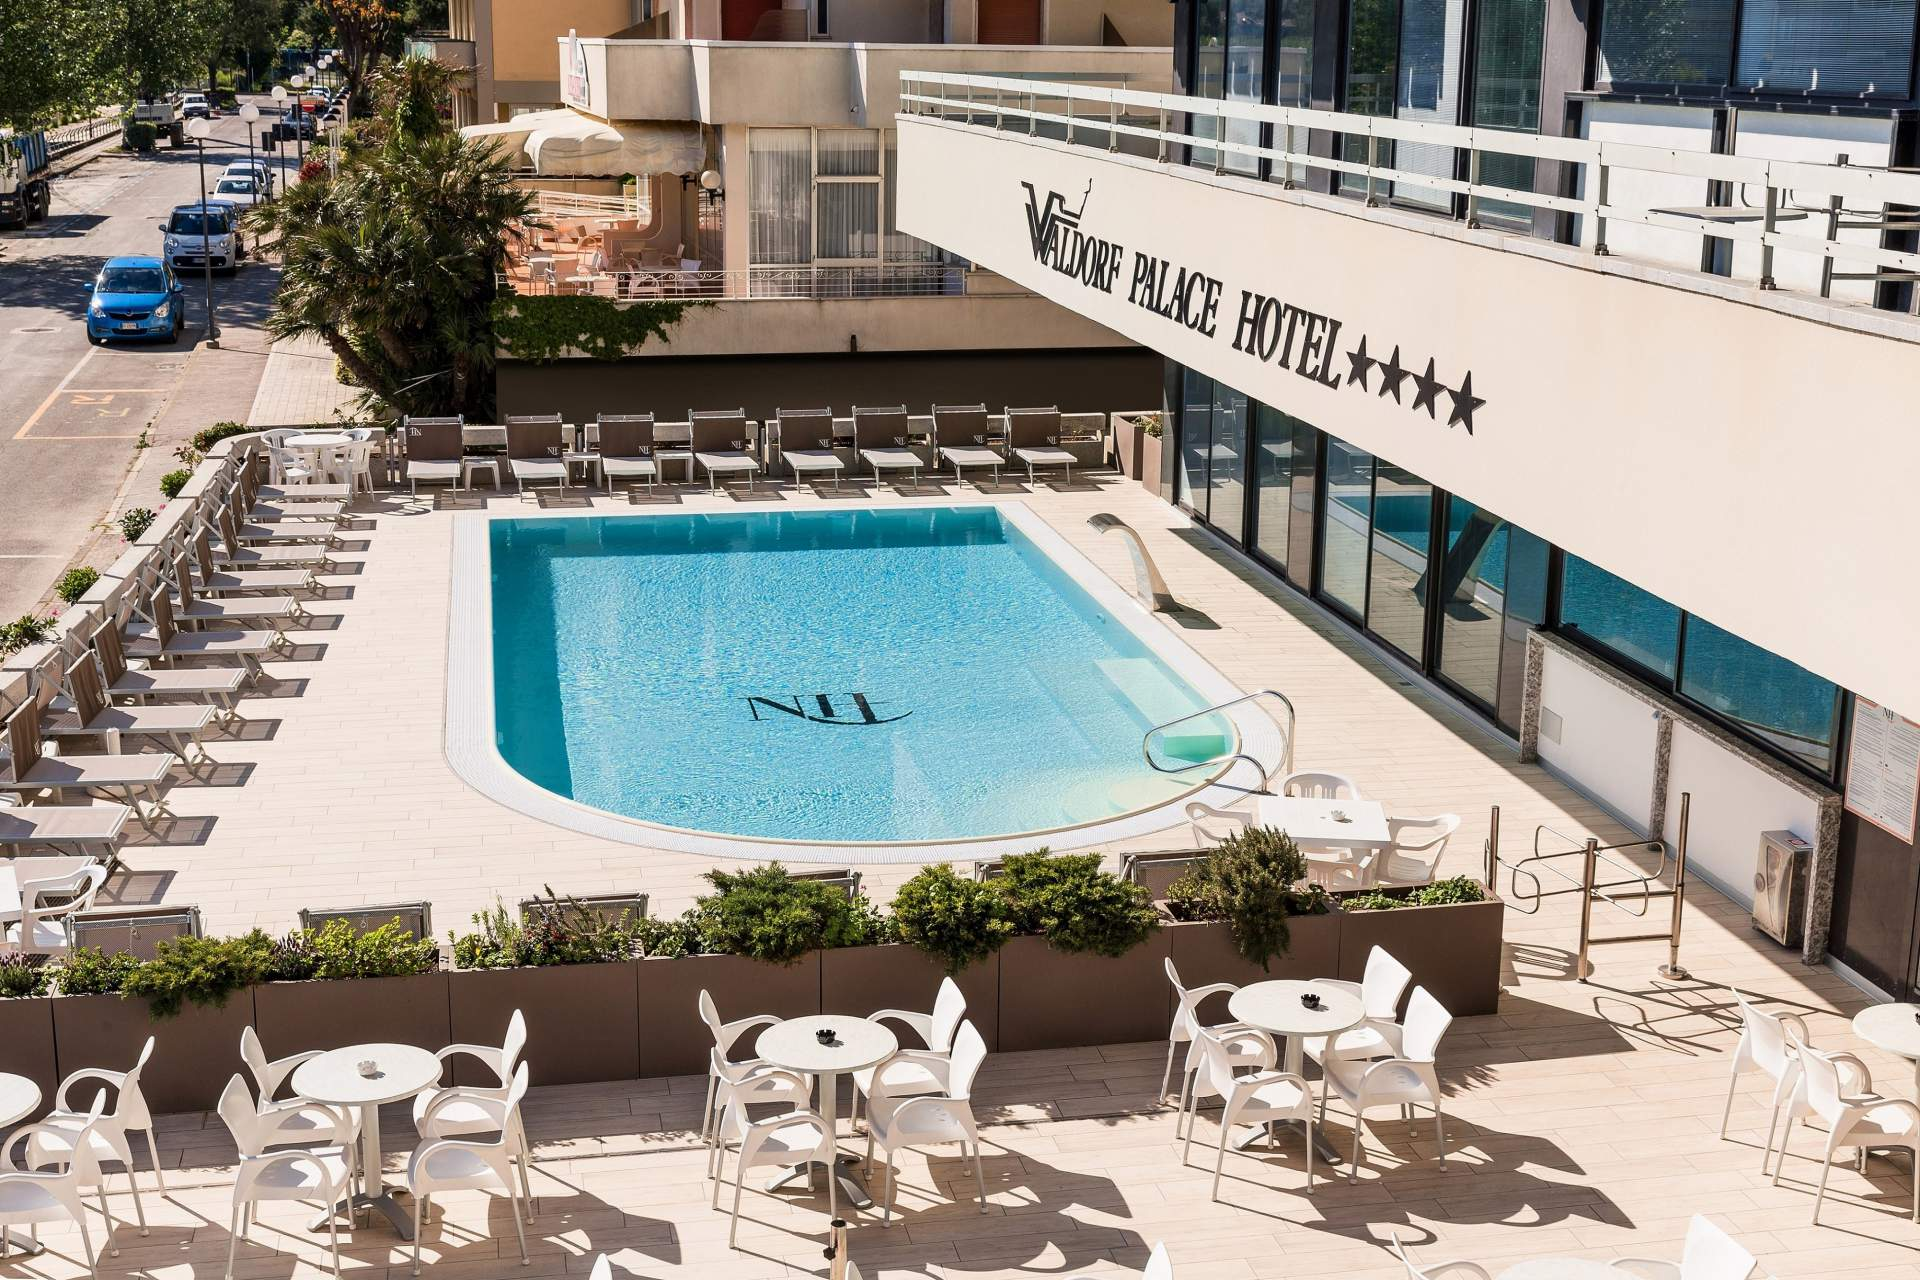 Busreis Cattolica Hotel Waldorf Palace strandvakantie